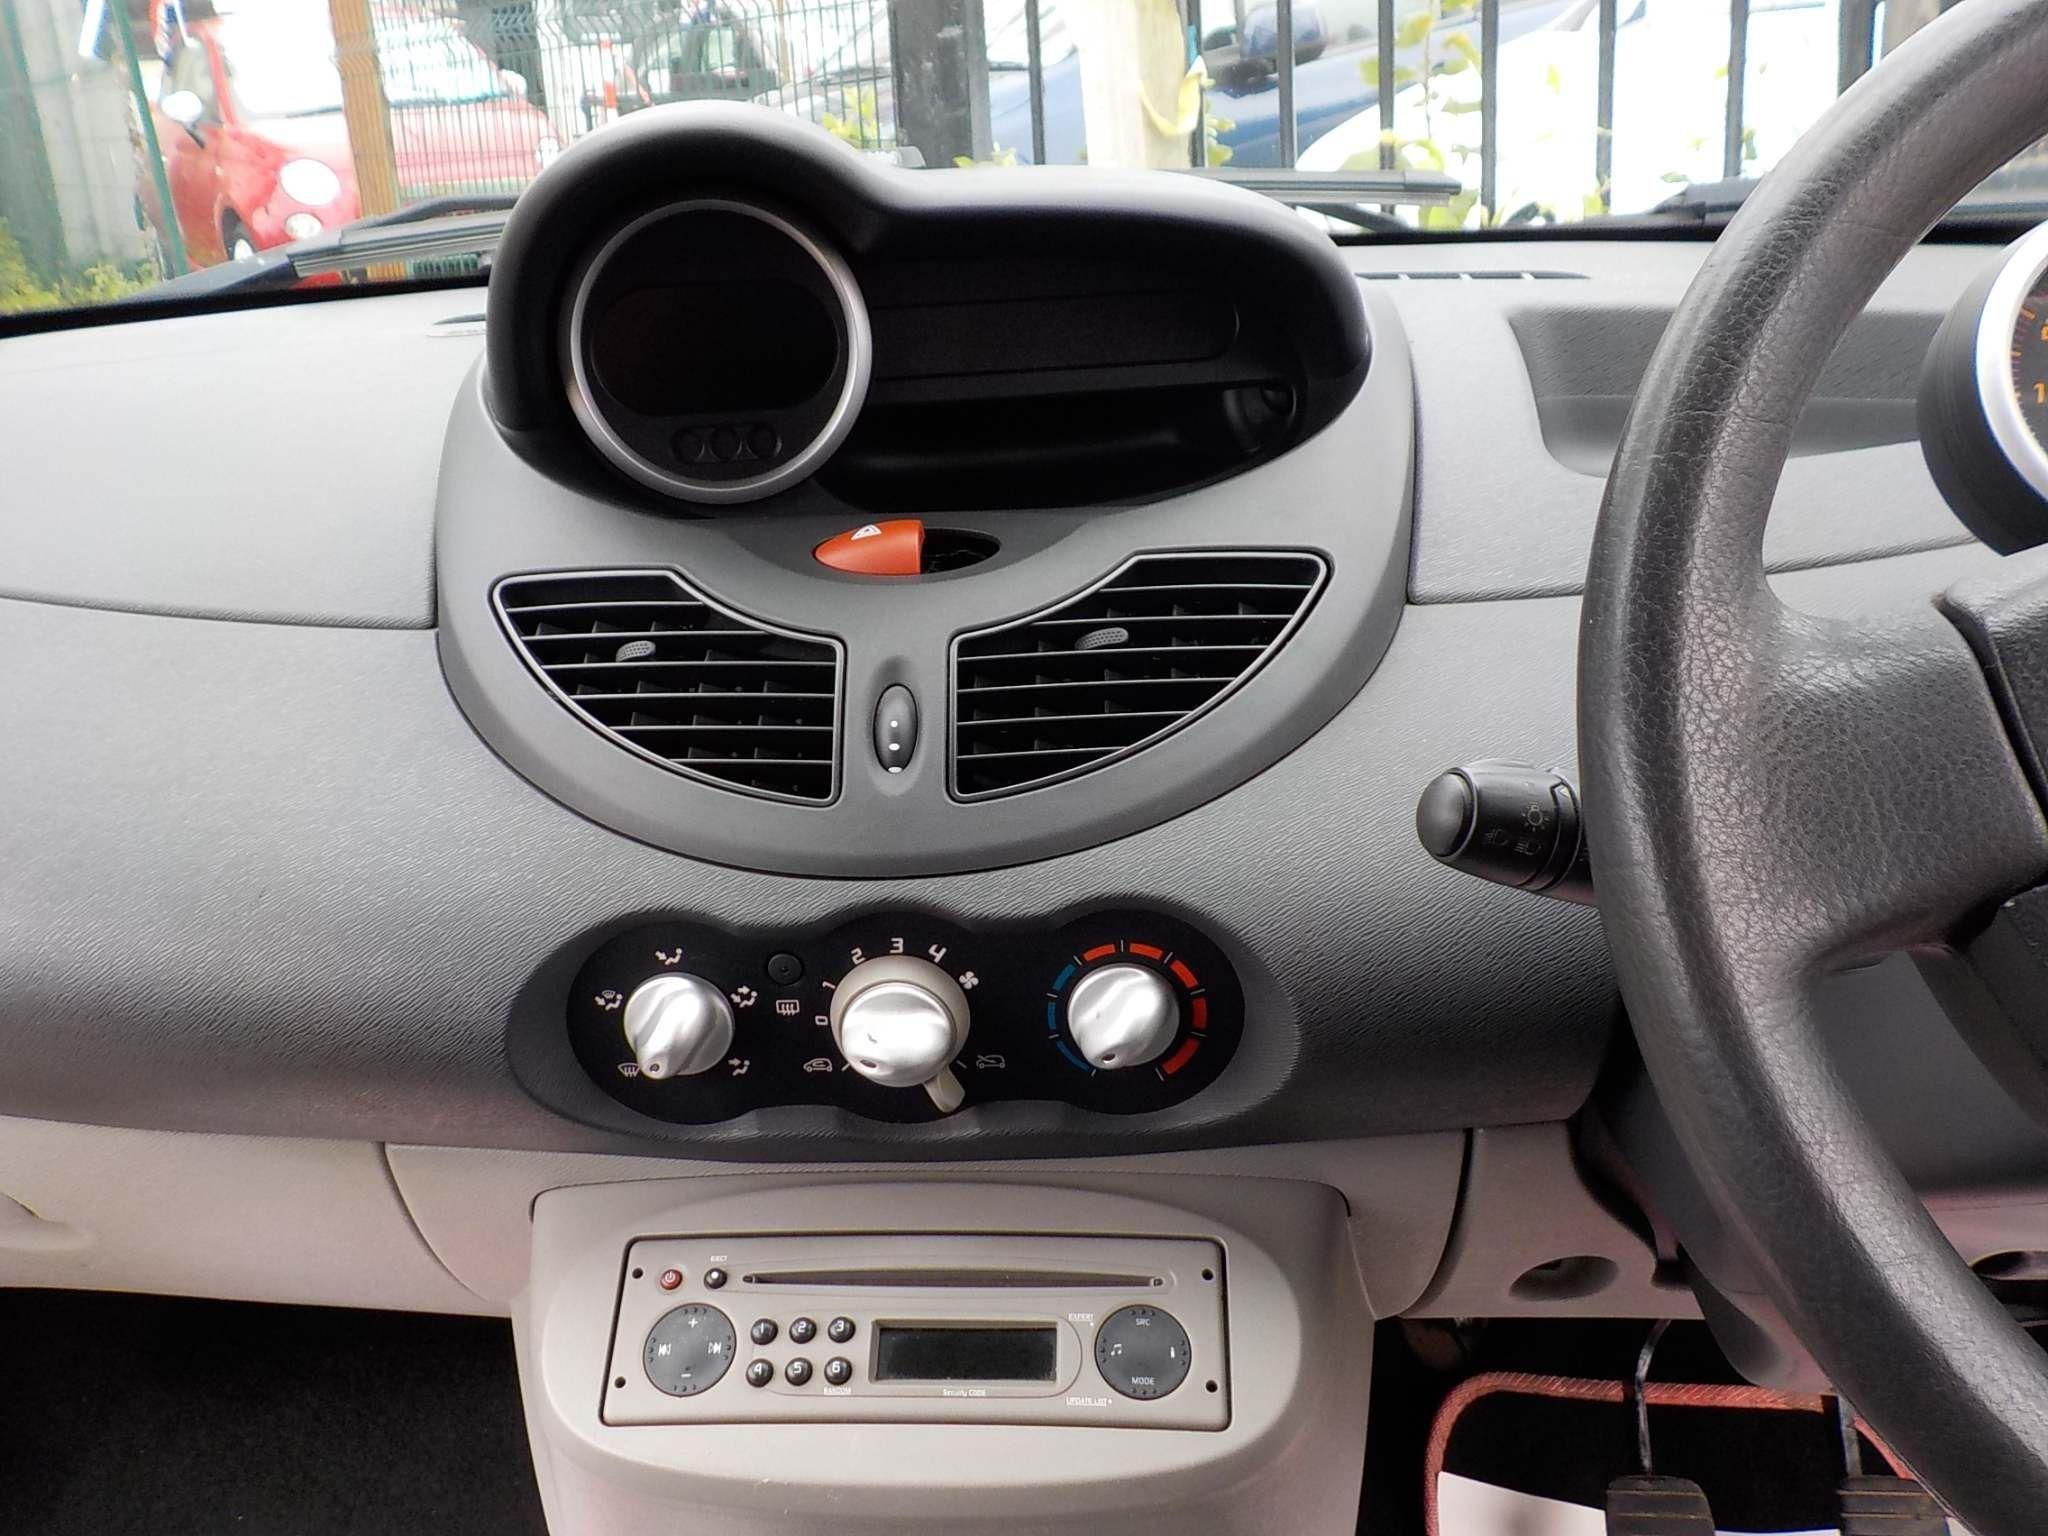 Renault Twingo 1.2 Extreme 3dr